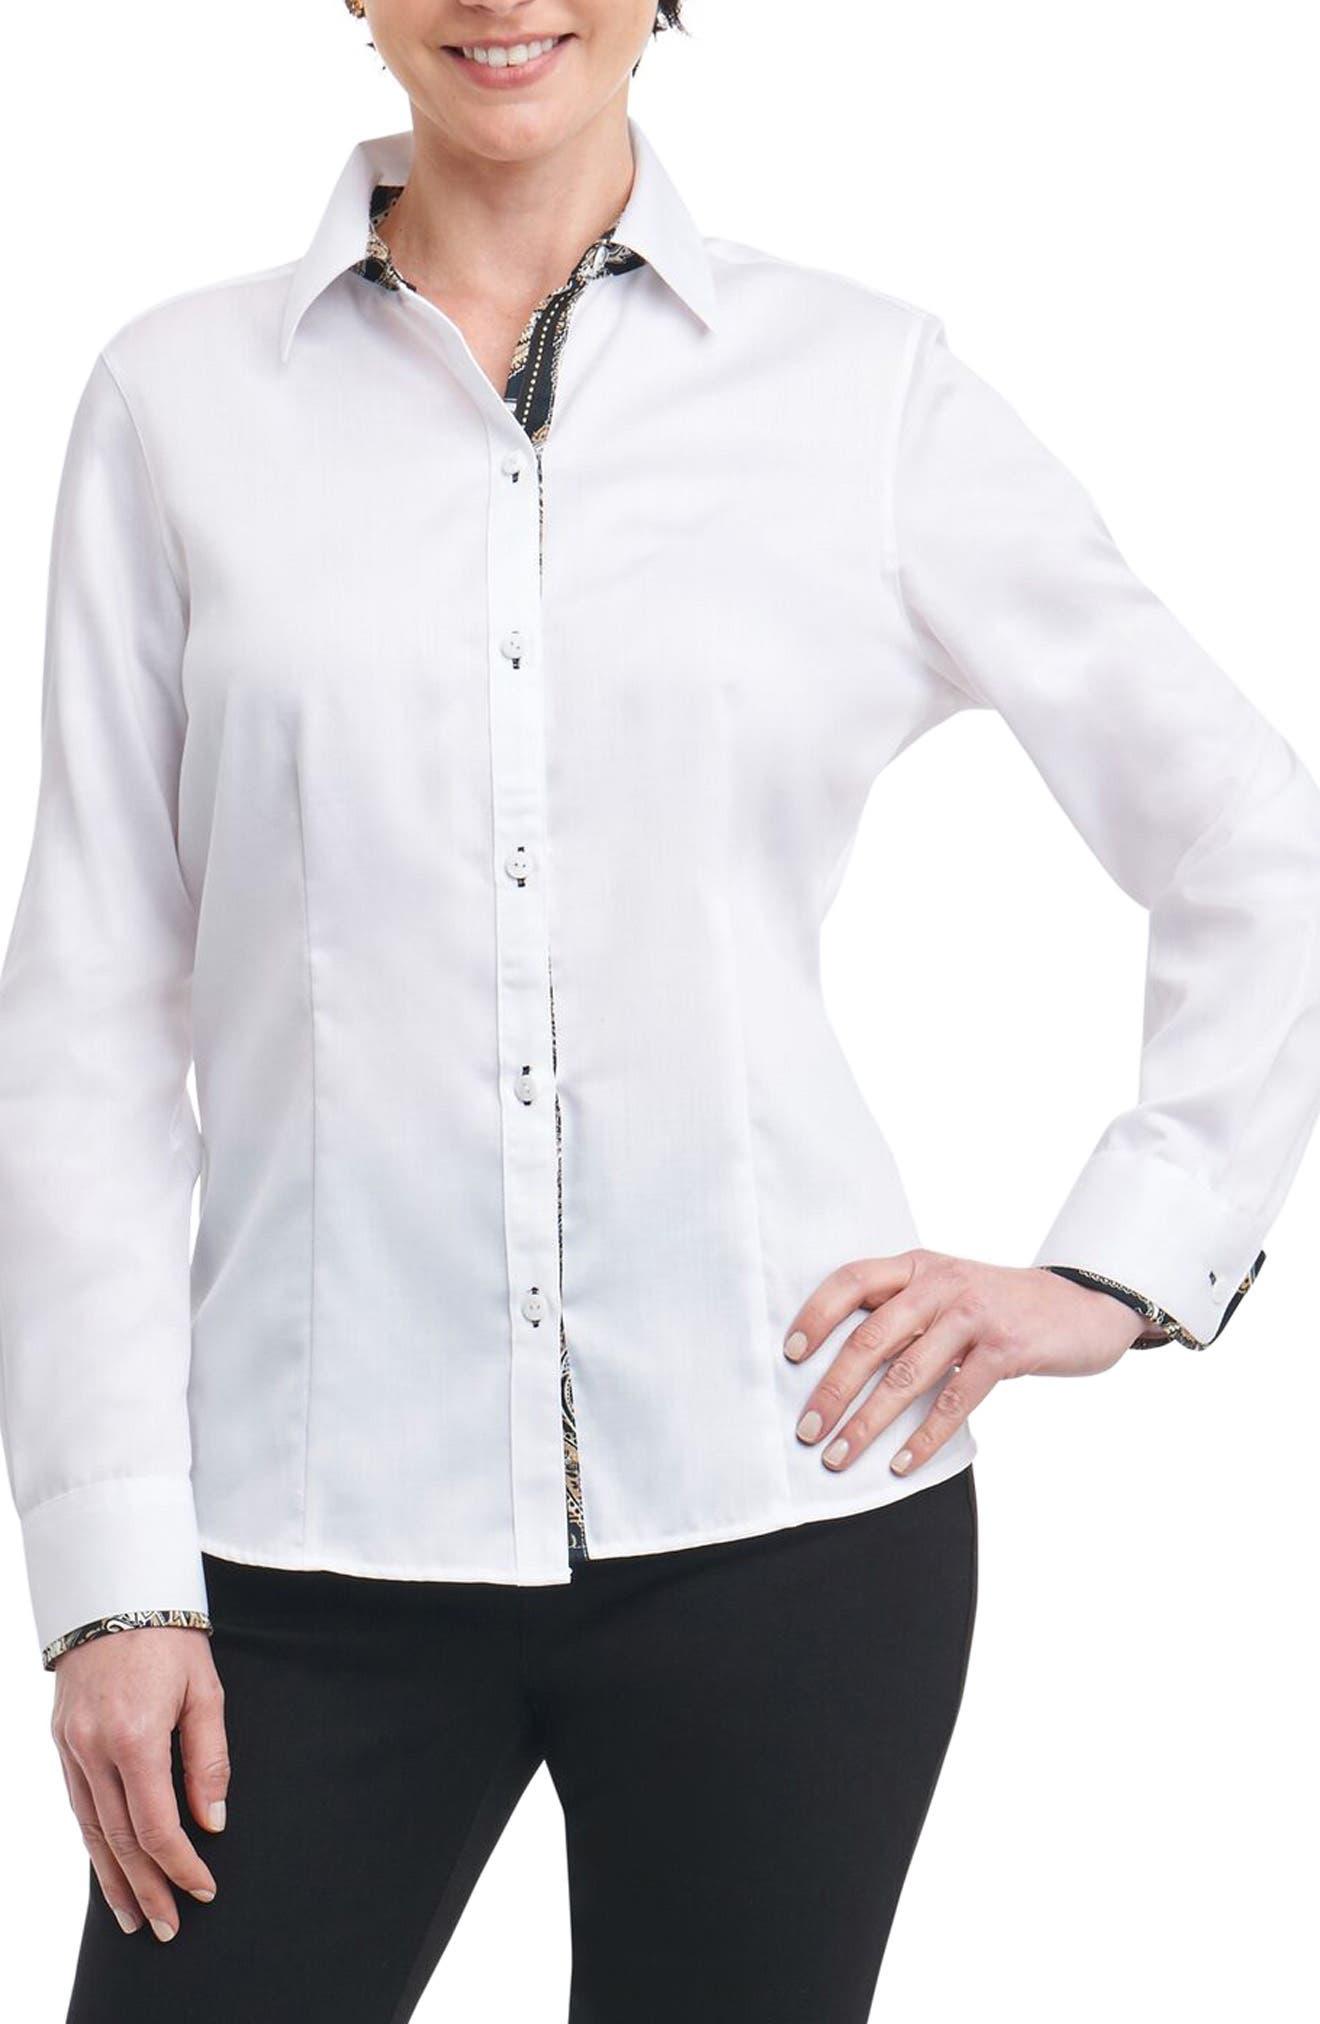 Alternate Image 1 Selected - Foxcroft Brooke Contrast Trim Sateen Shirt